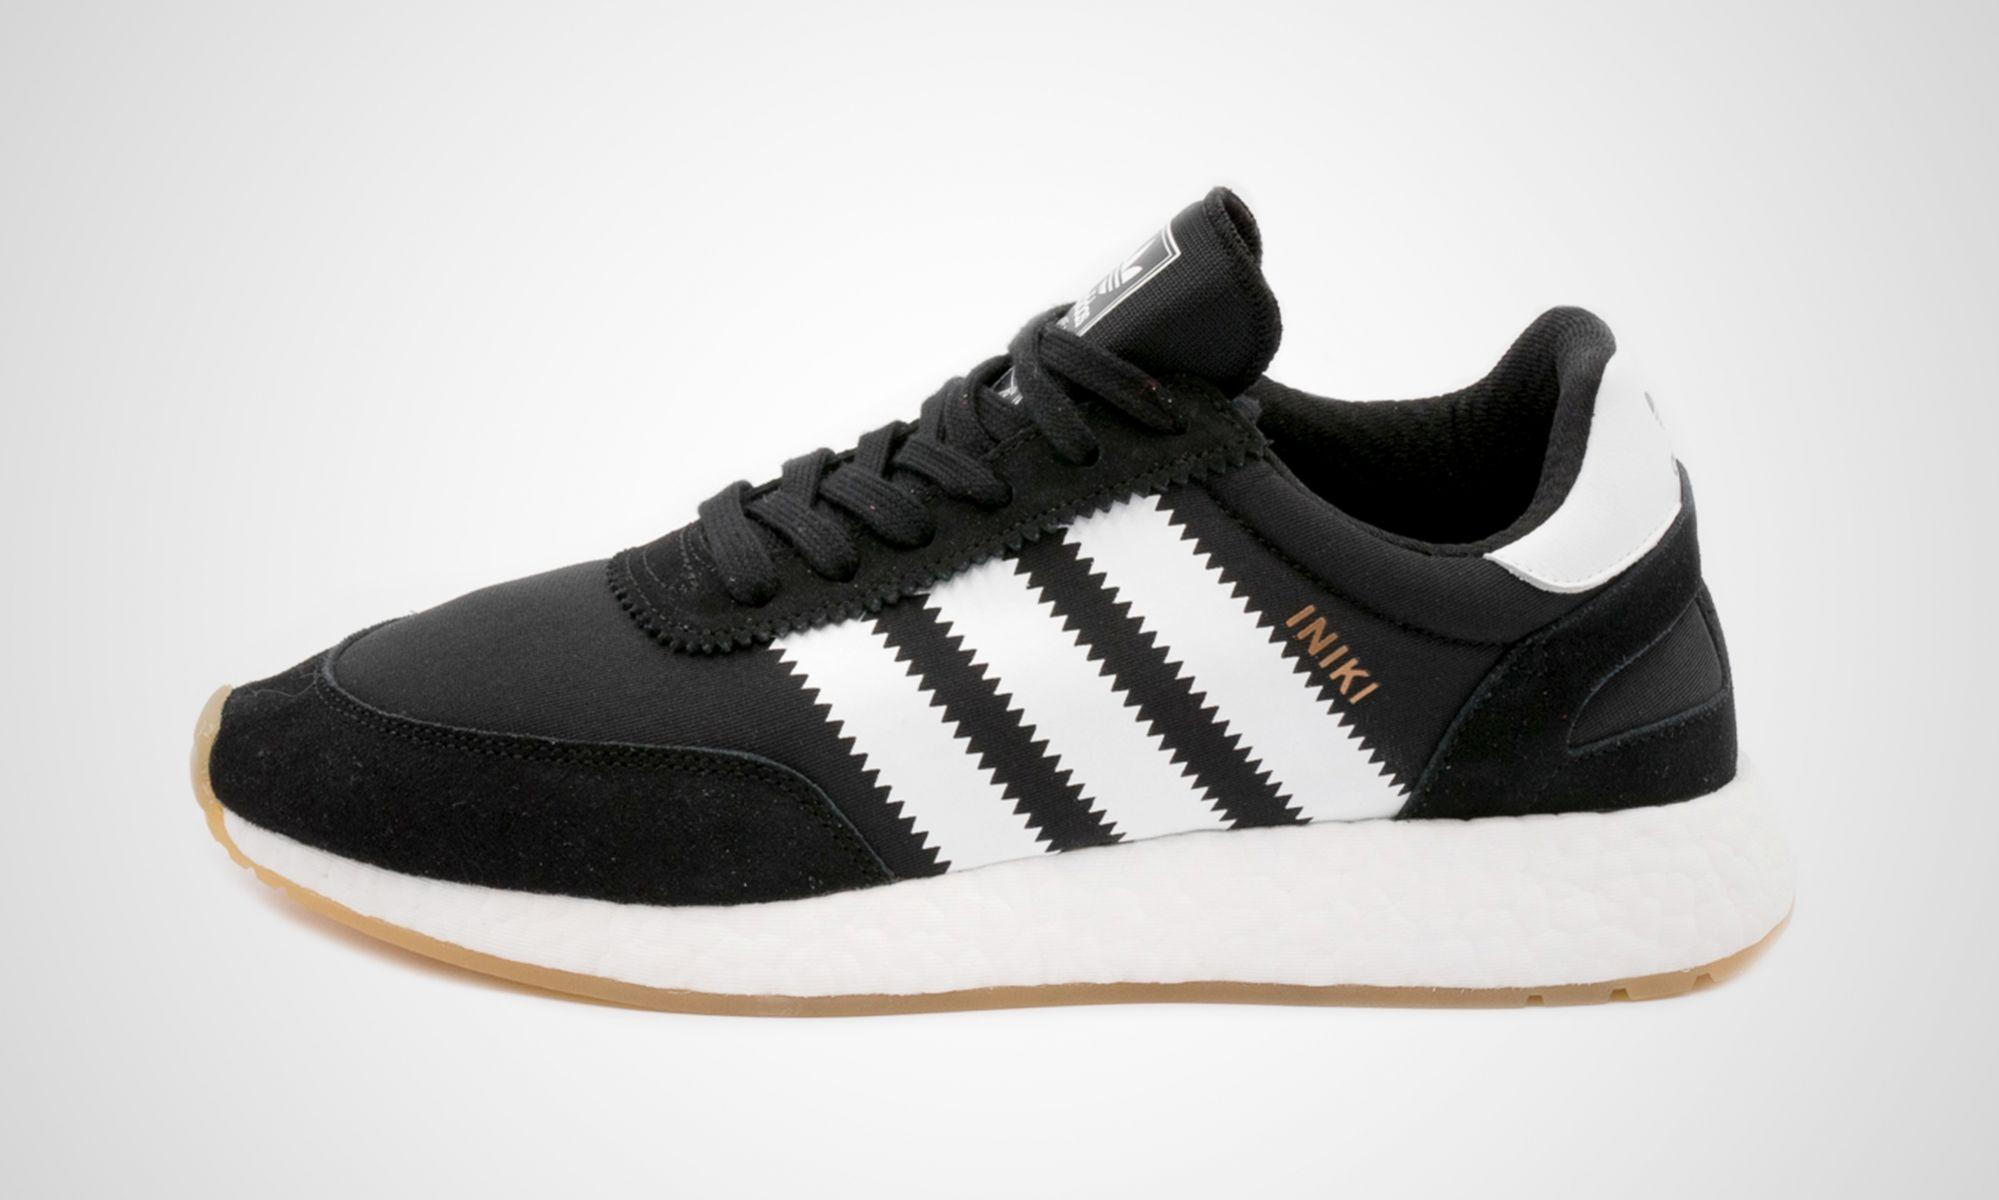 adidas iniki black gum dead stock sneakerblog